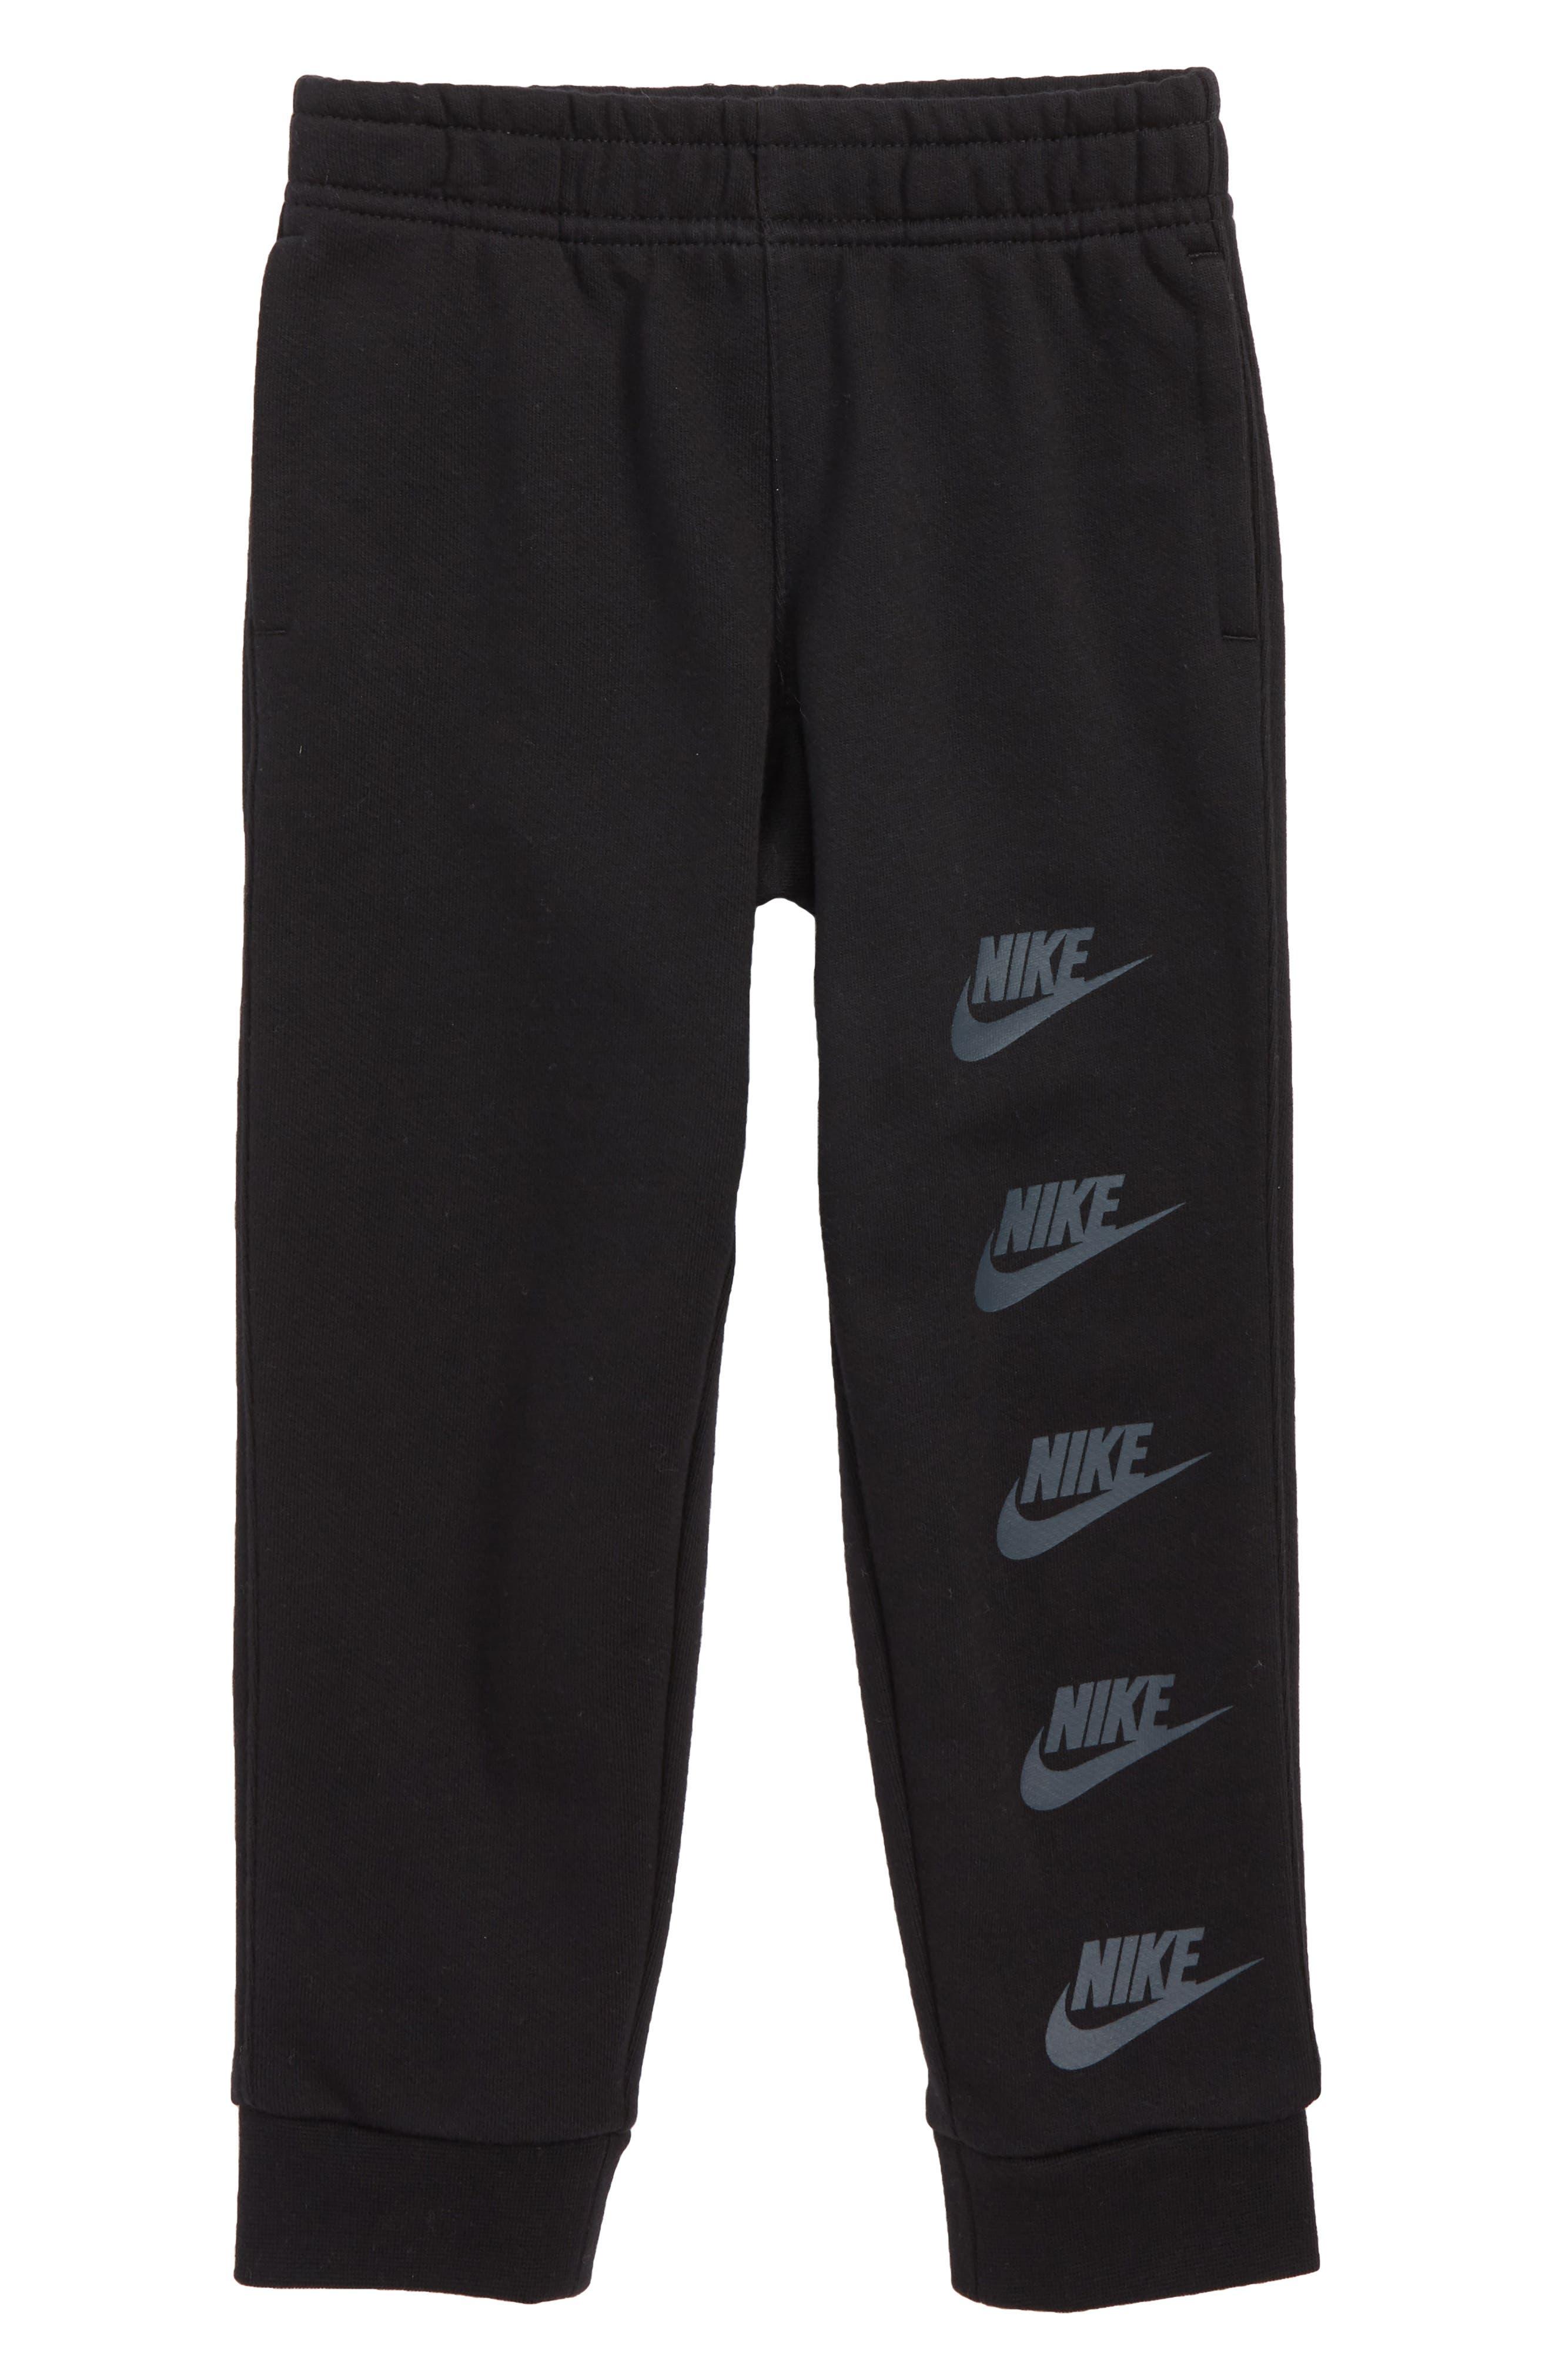 Sportswear Club Archive Sweatpants,                         Main,                         color, BLACK